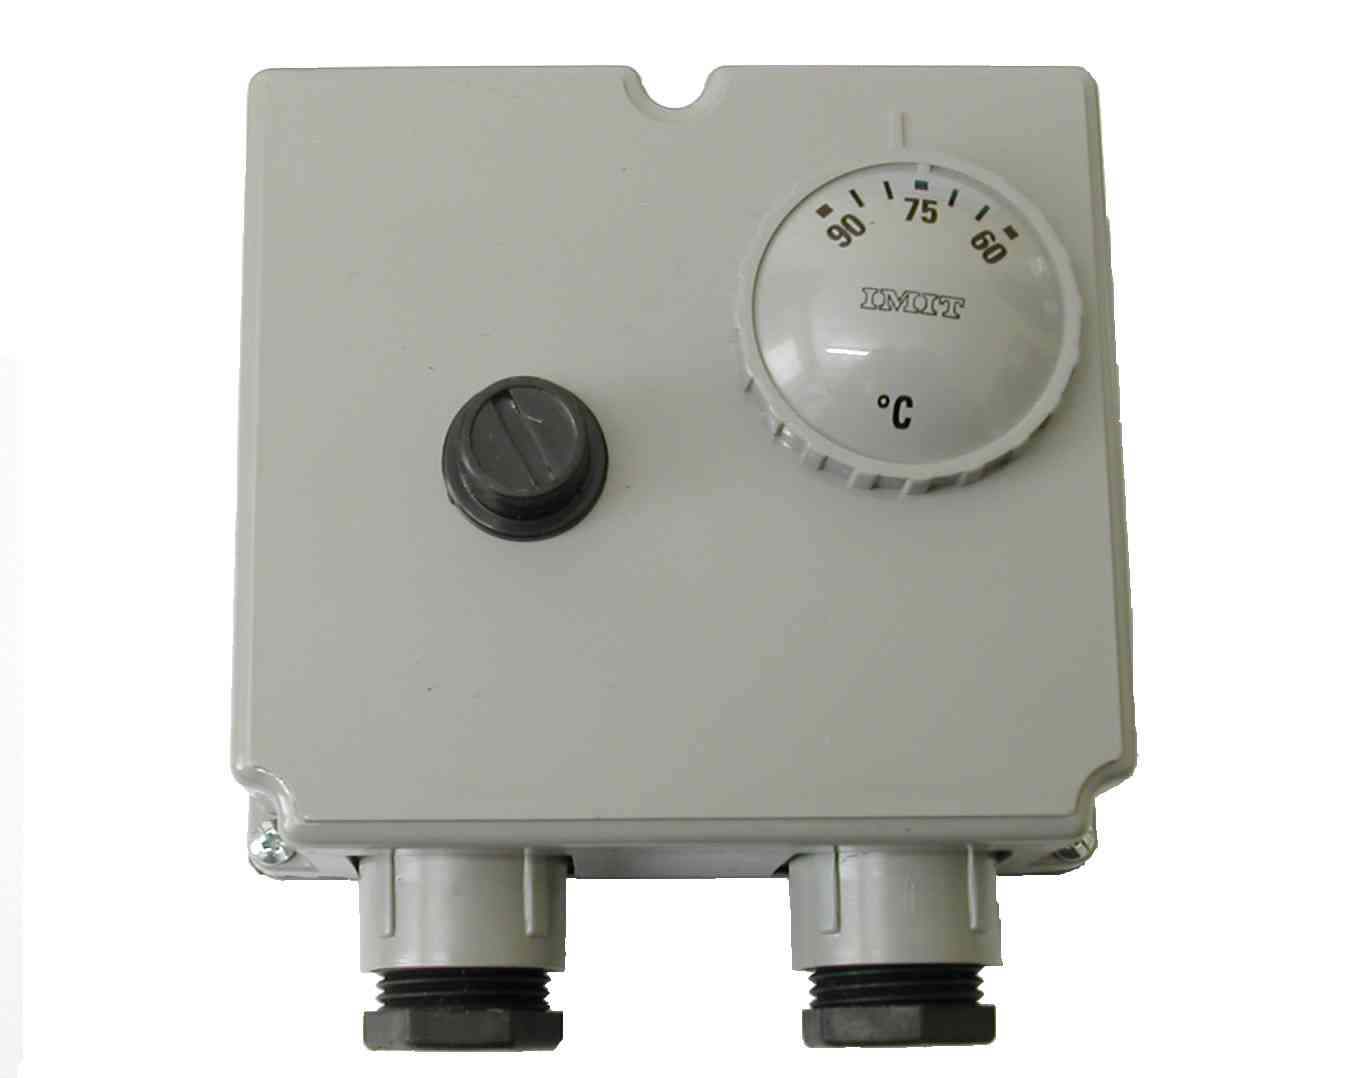 imit boiler dual thermostat tlsc 542816 stevenson plumbing, wire diagram, imit dual thermostat wiring diagram